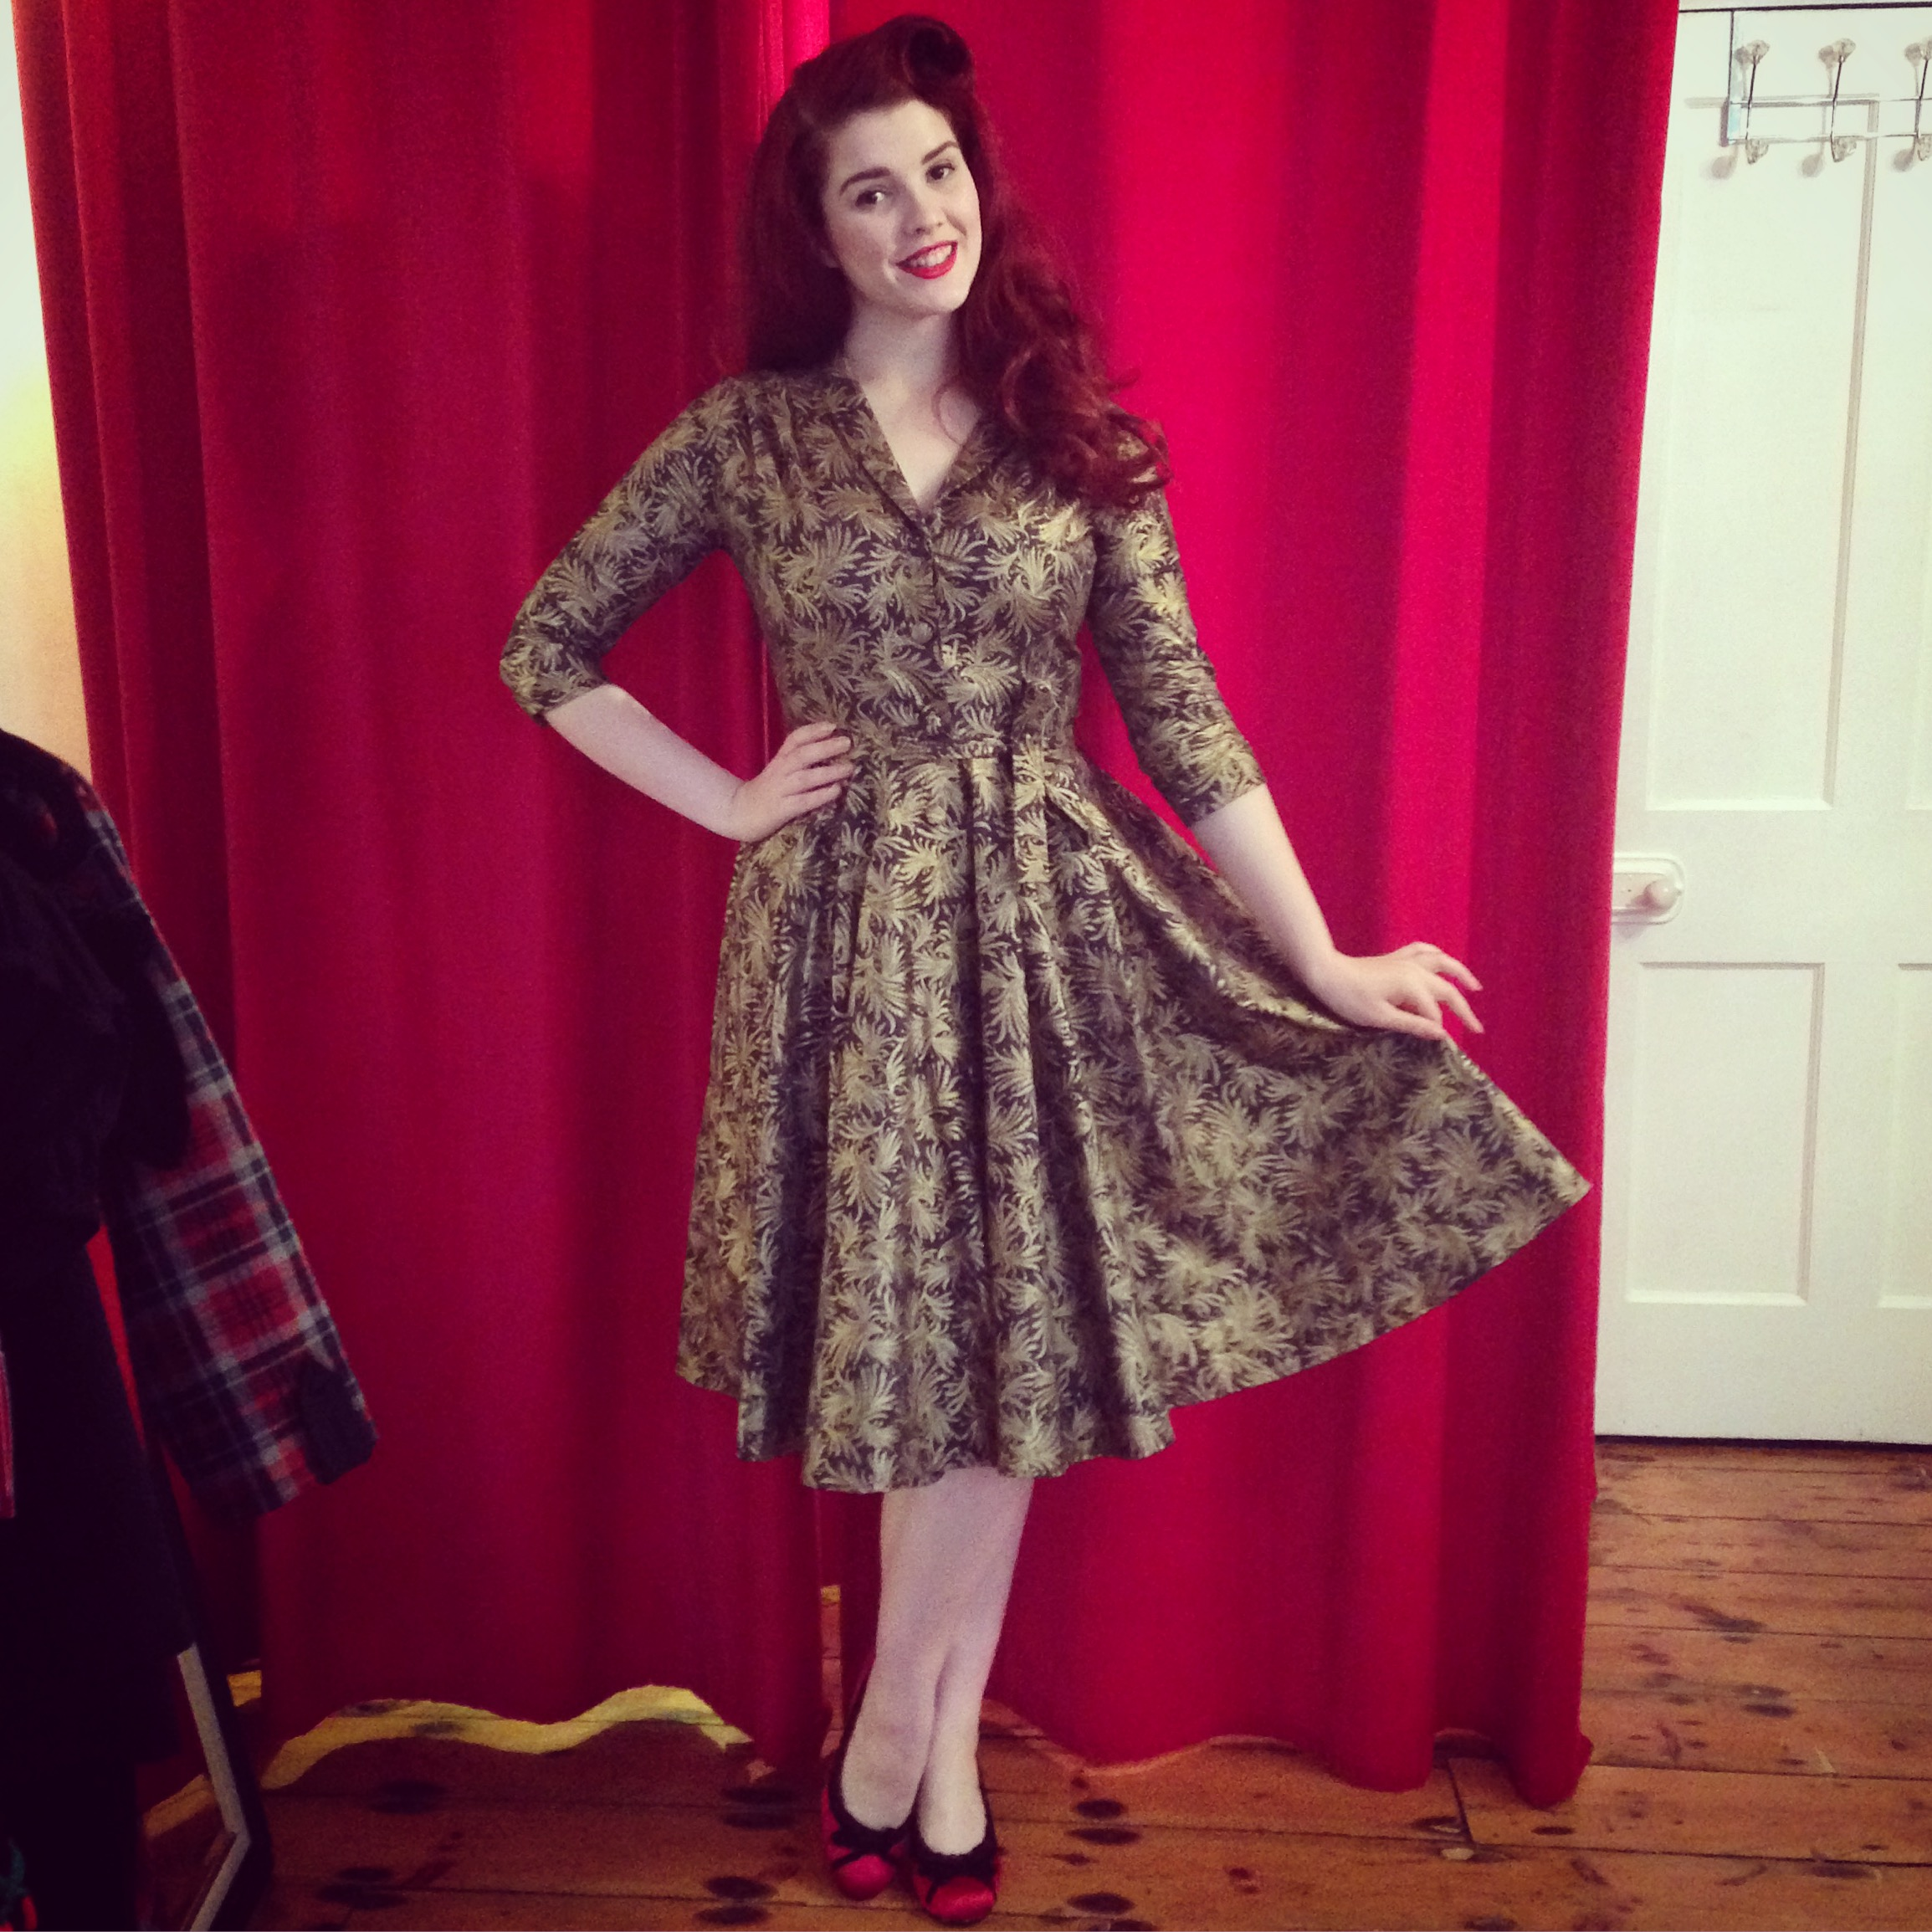 Monte Carlo Flourish Dress £150.00